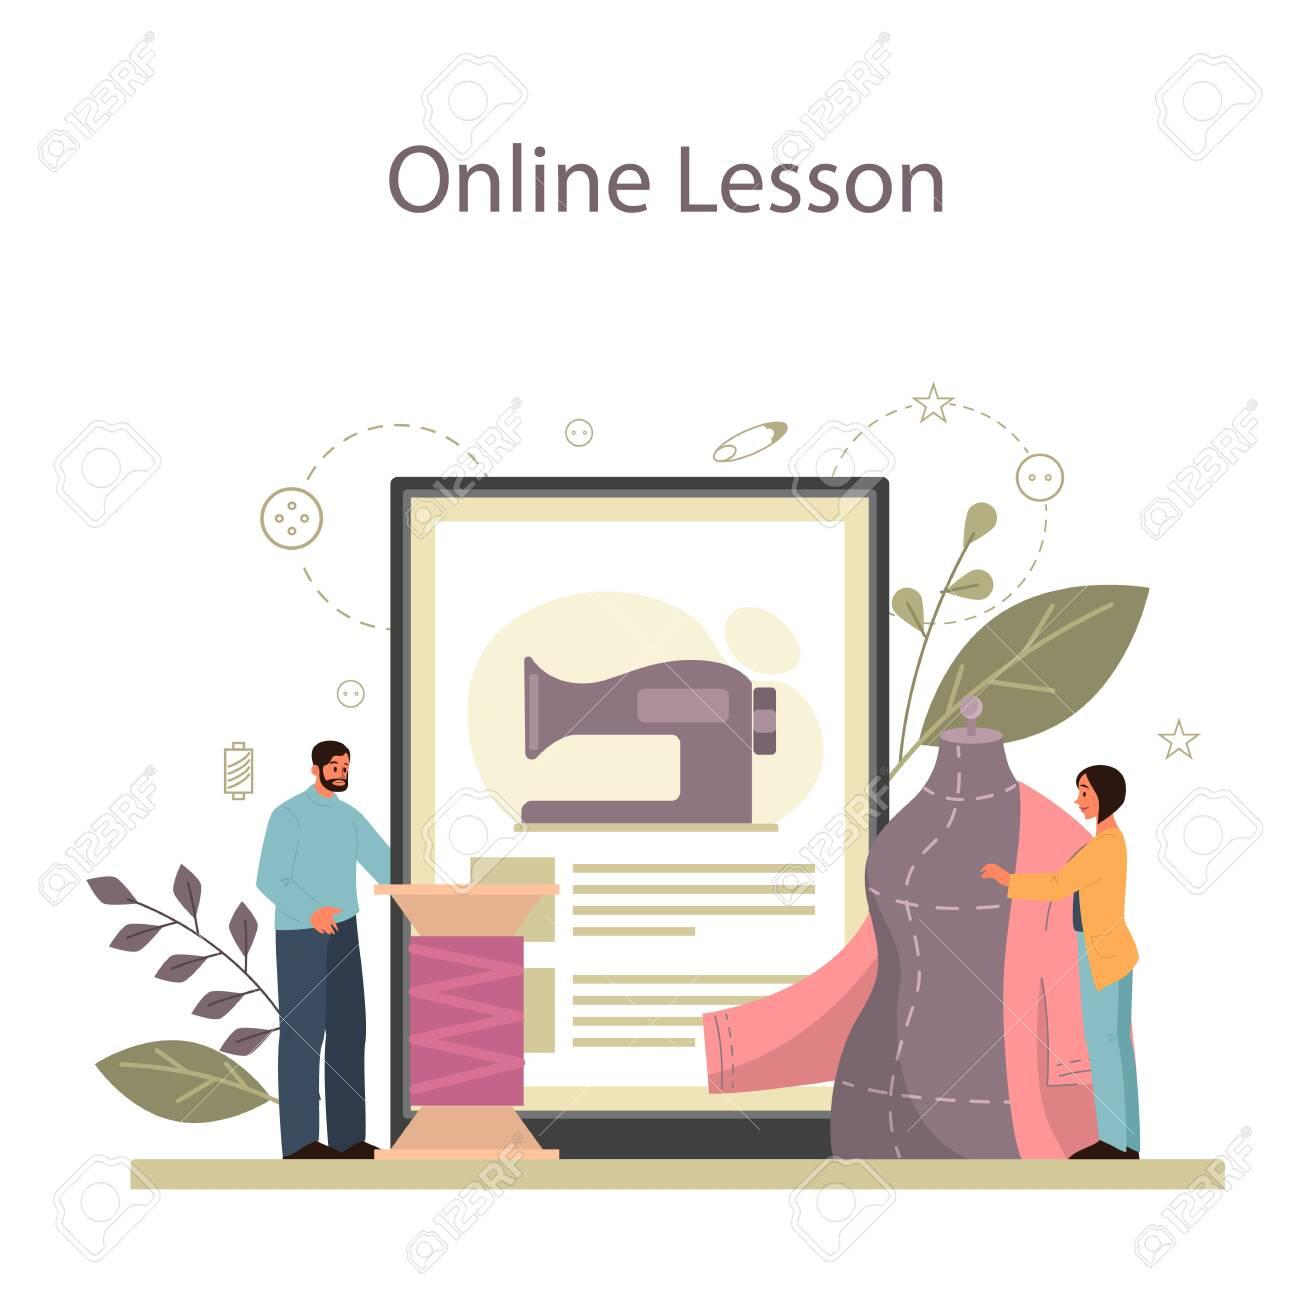 Fashion Designer Or Tailor Online Service Or Platform Professional Royalty Free Cliparts Vectors And Stock Illustration Image 147808782